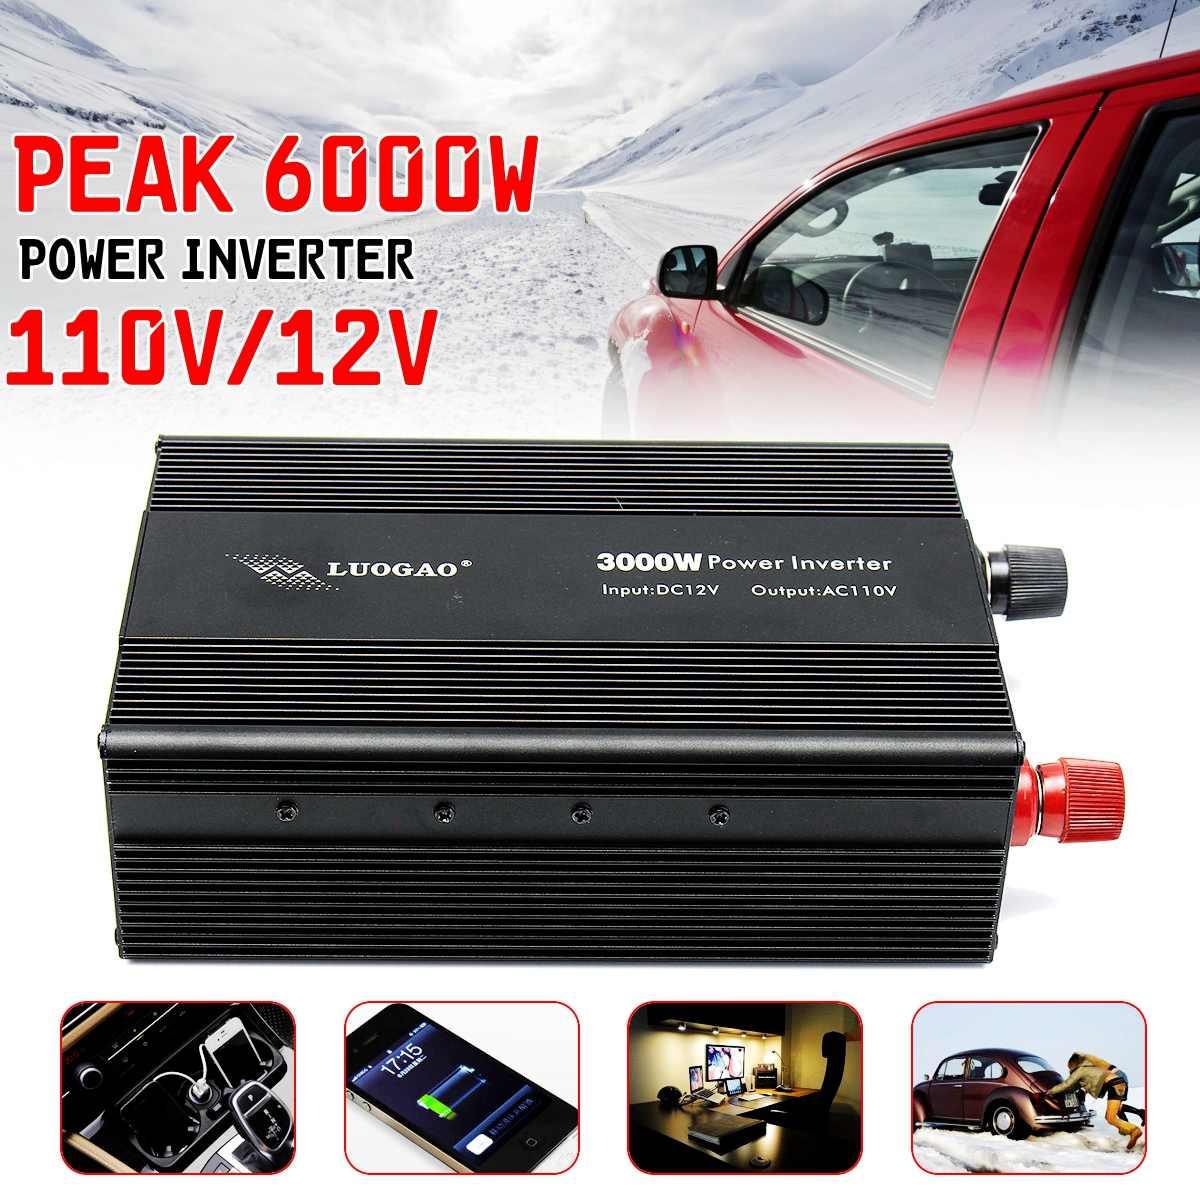 Modified Sine Wave Power Inverter 3000W 6000W Peaks DC12V to AC110V/220V Car HomeModified Sine Wave Power Inverter 3000W 6000W Peaks DC12V to AC110V/220V Car Home